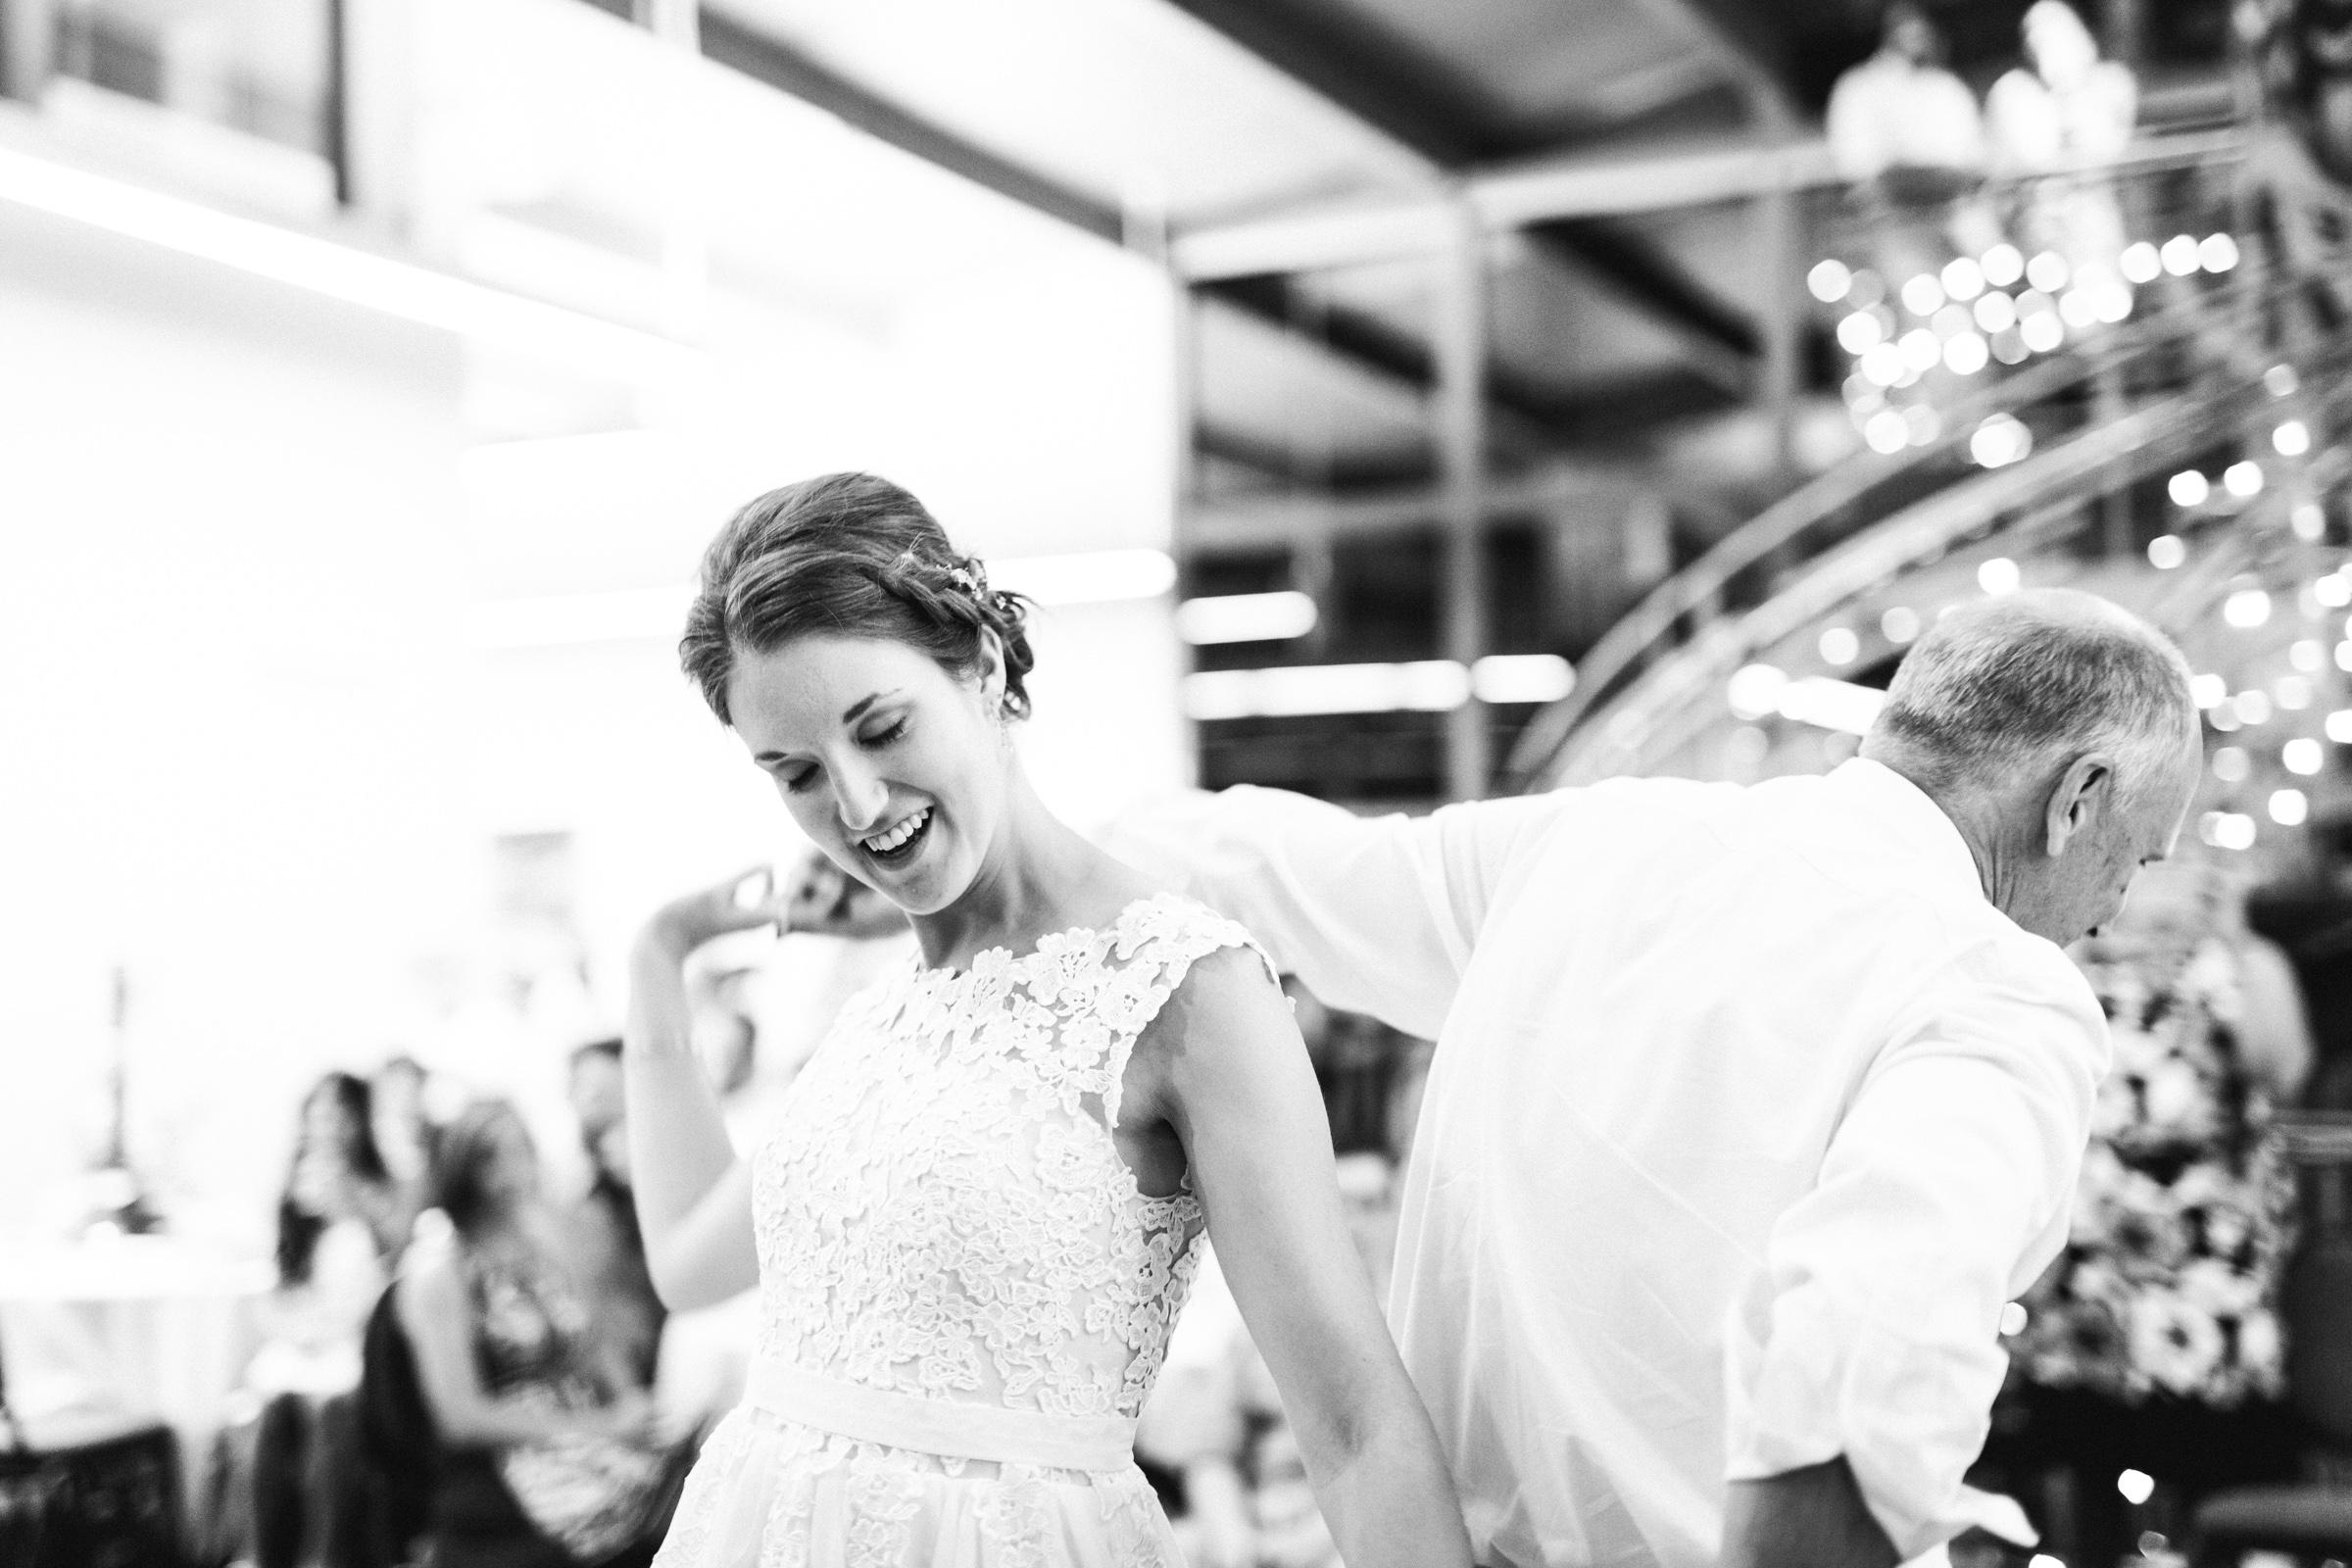 LukeSarah-Seattle-Wedding-080516-0382-2.jpg